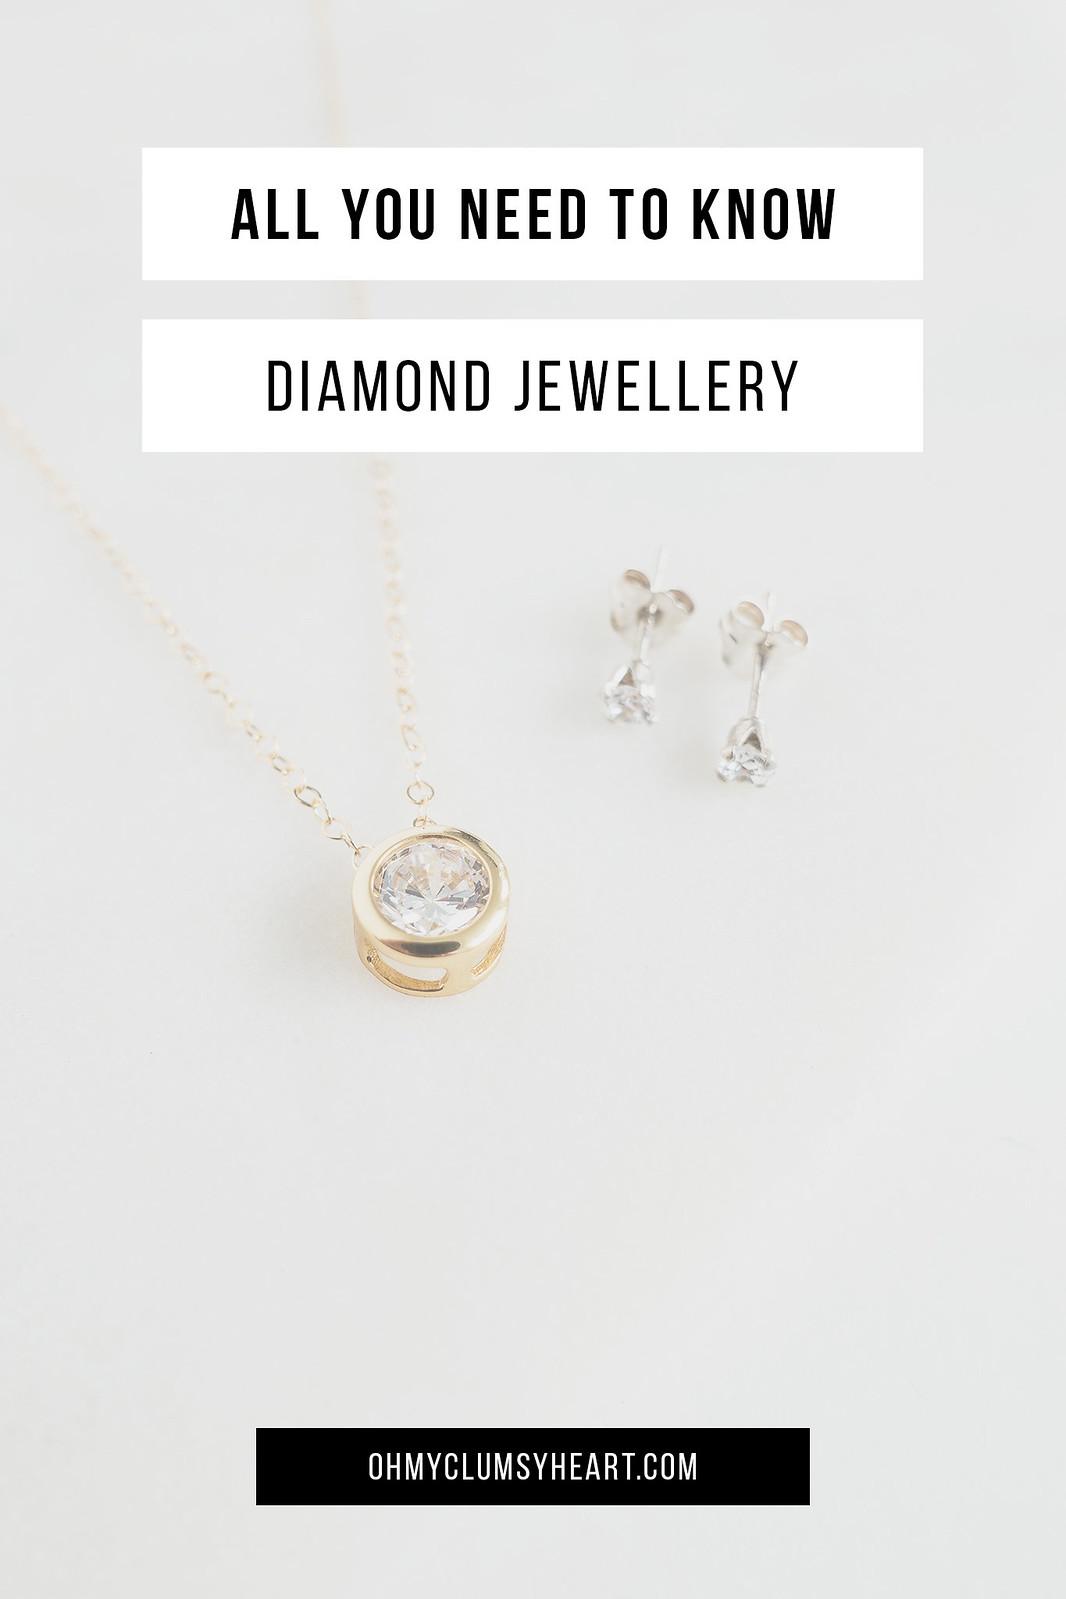 All You Need To Know: Diamond Jewellery